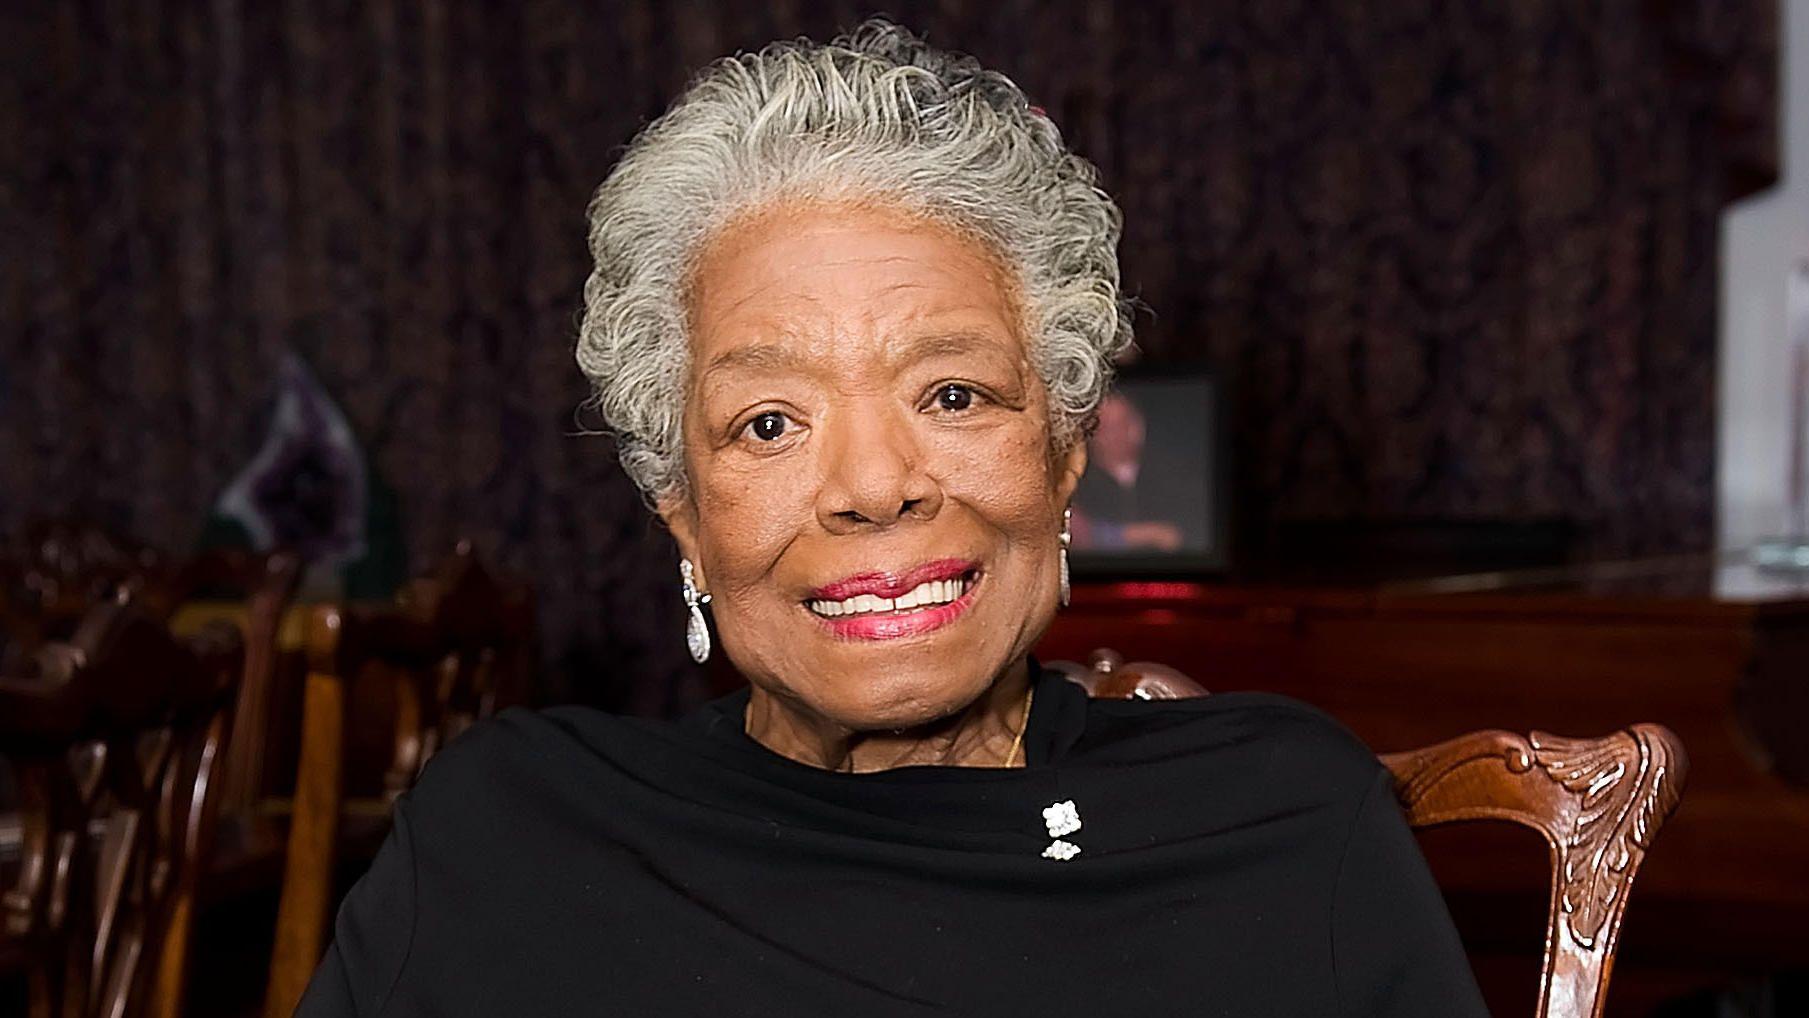 Photo of Maya Angelou at https://www.pinterest.com/sweetdrk1/maya-angelou/